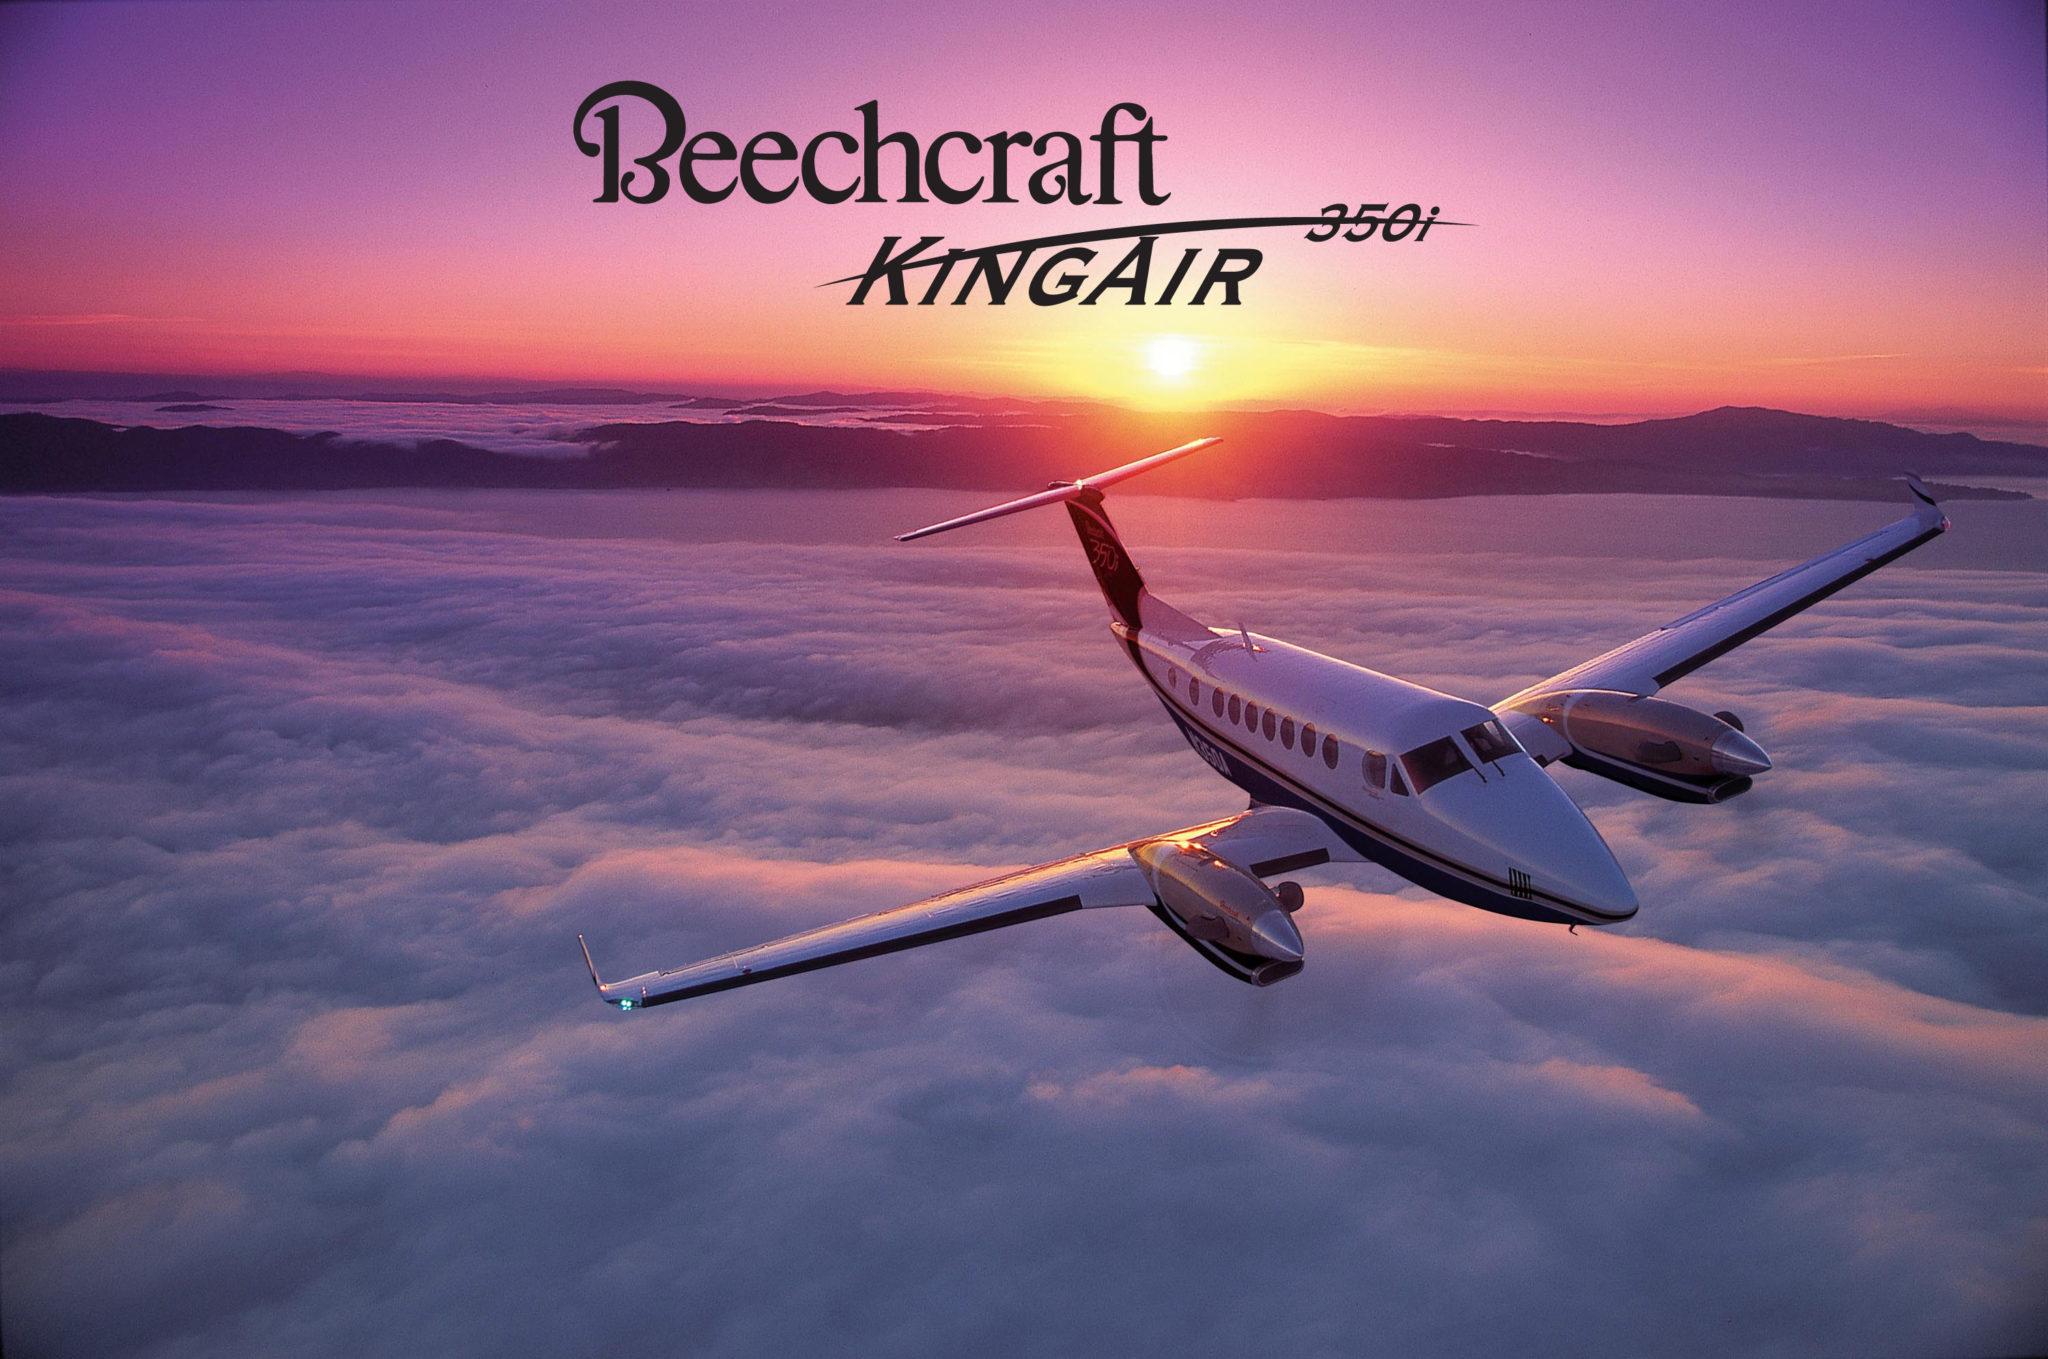 Beechcraft Corporation announced that Textron Inc  has